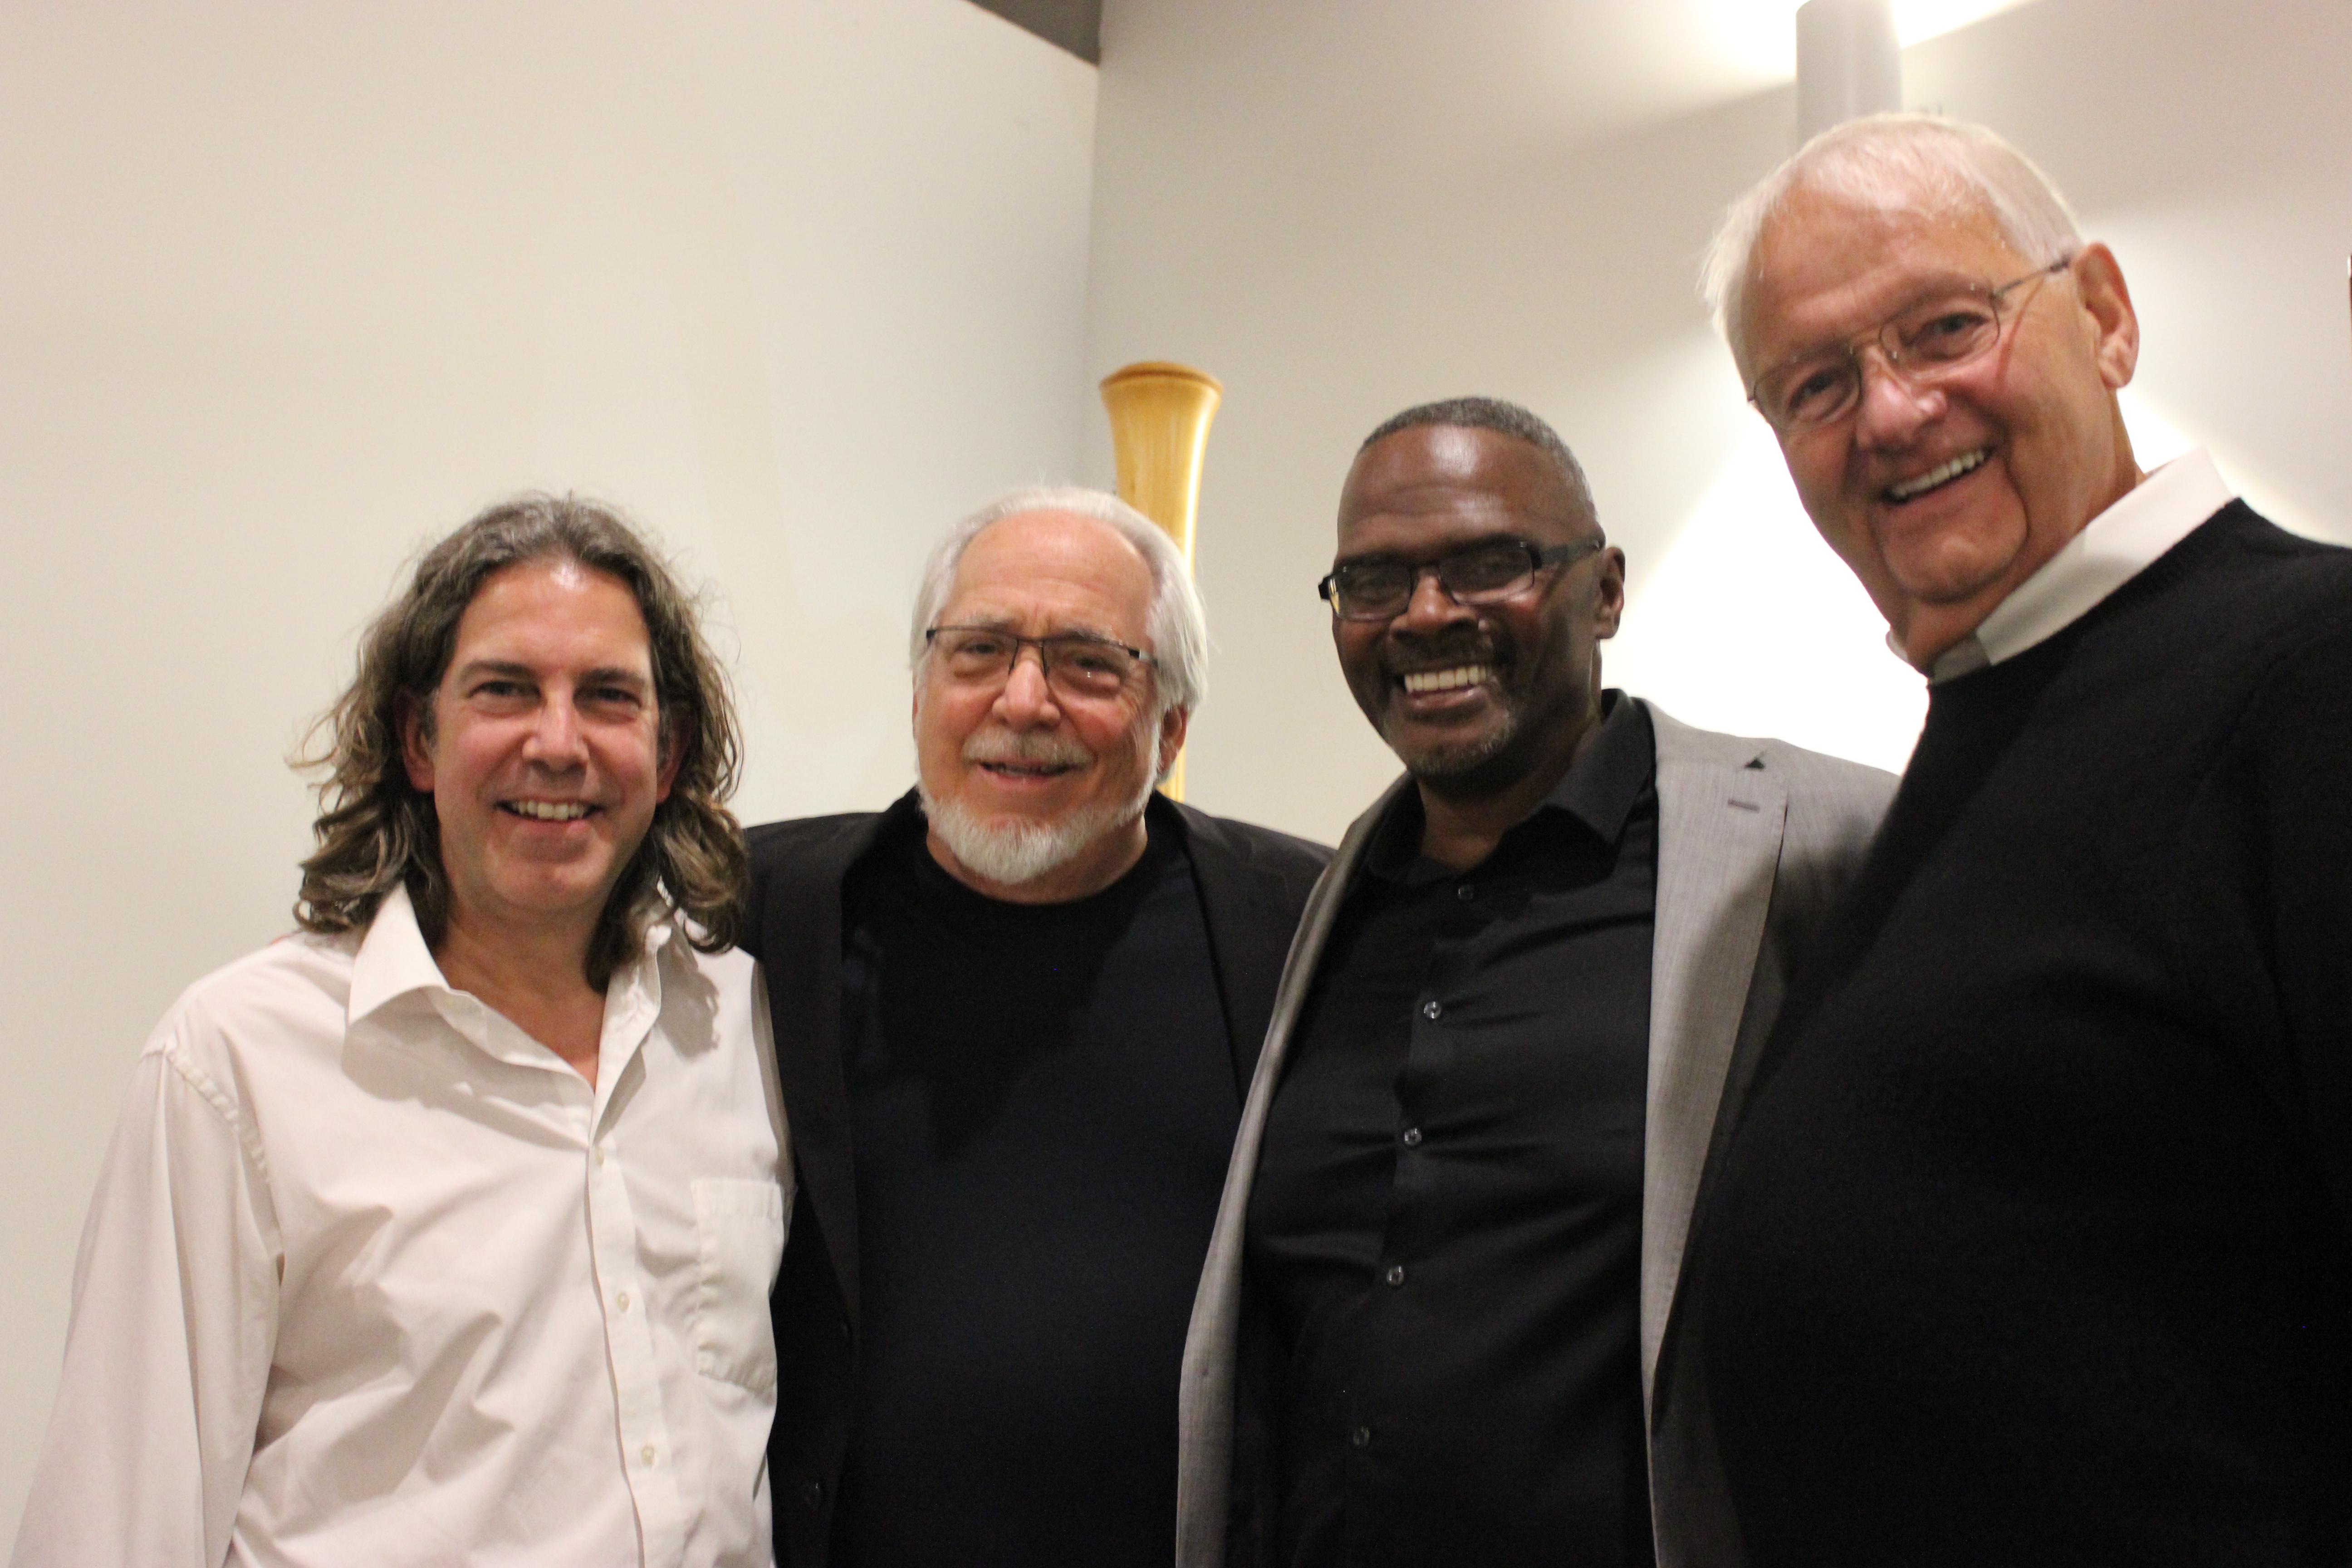 W. DuMelle, D. Chase, K. Anderson & M. Kaehr